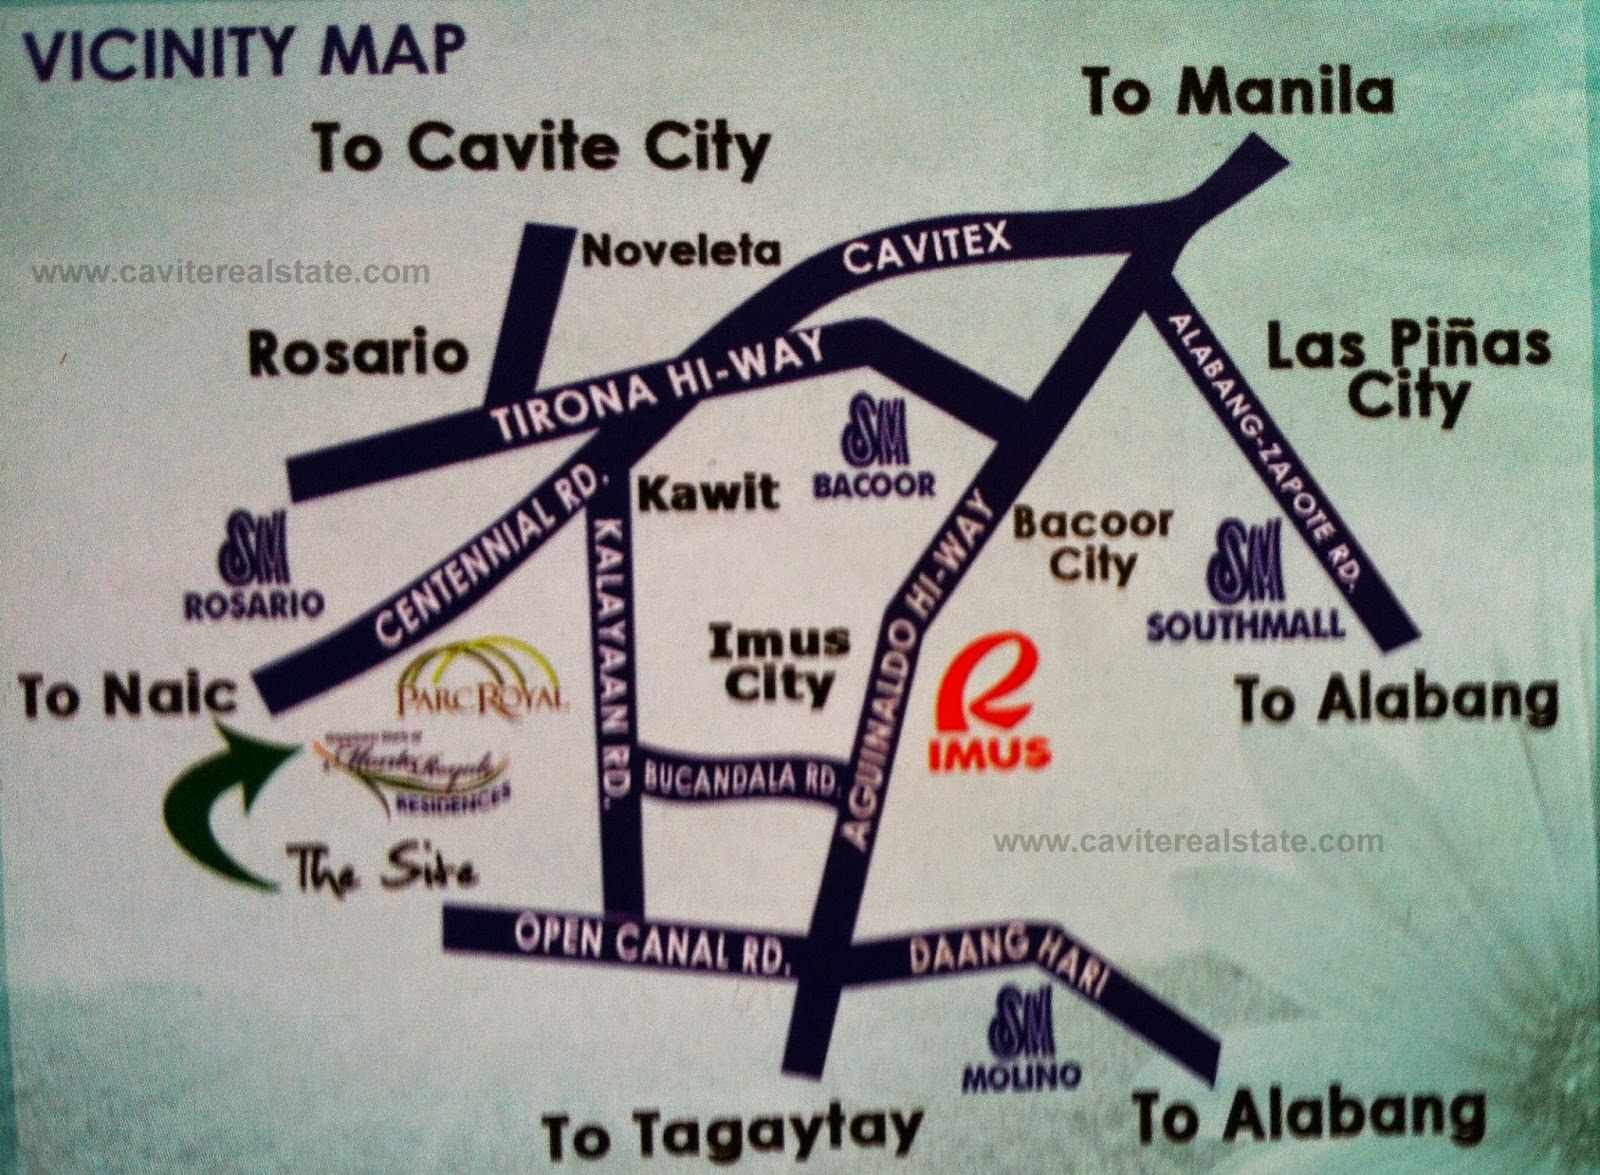 Camella silang tagaytay drina house and lot for sale in tagaytay city - Monte Royale Residences Masaito Homes